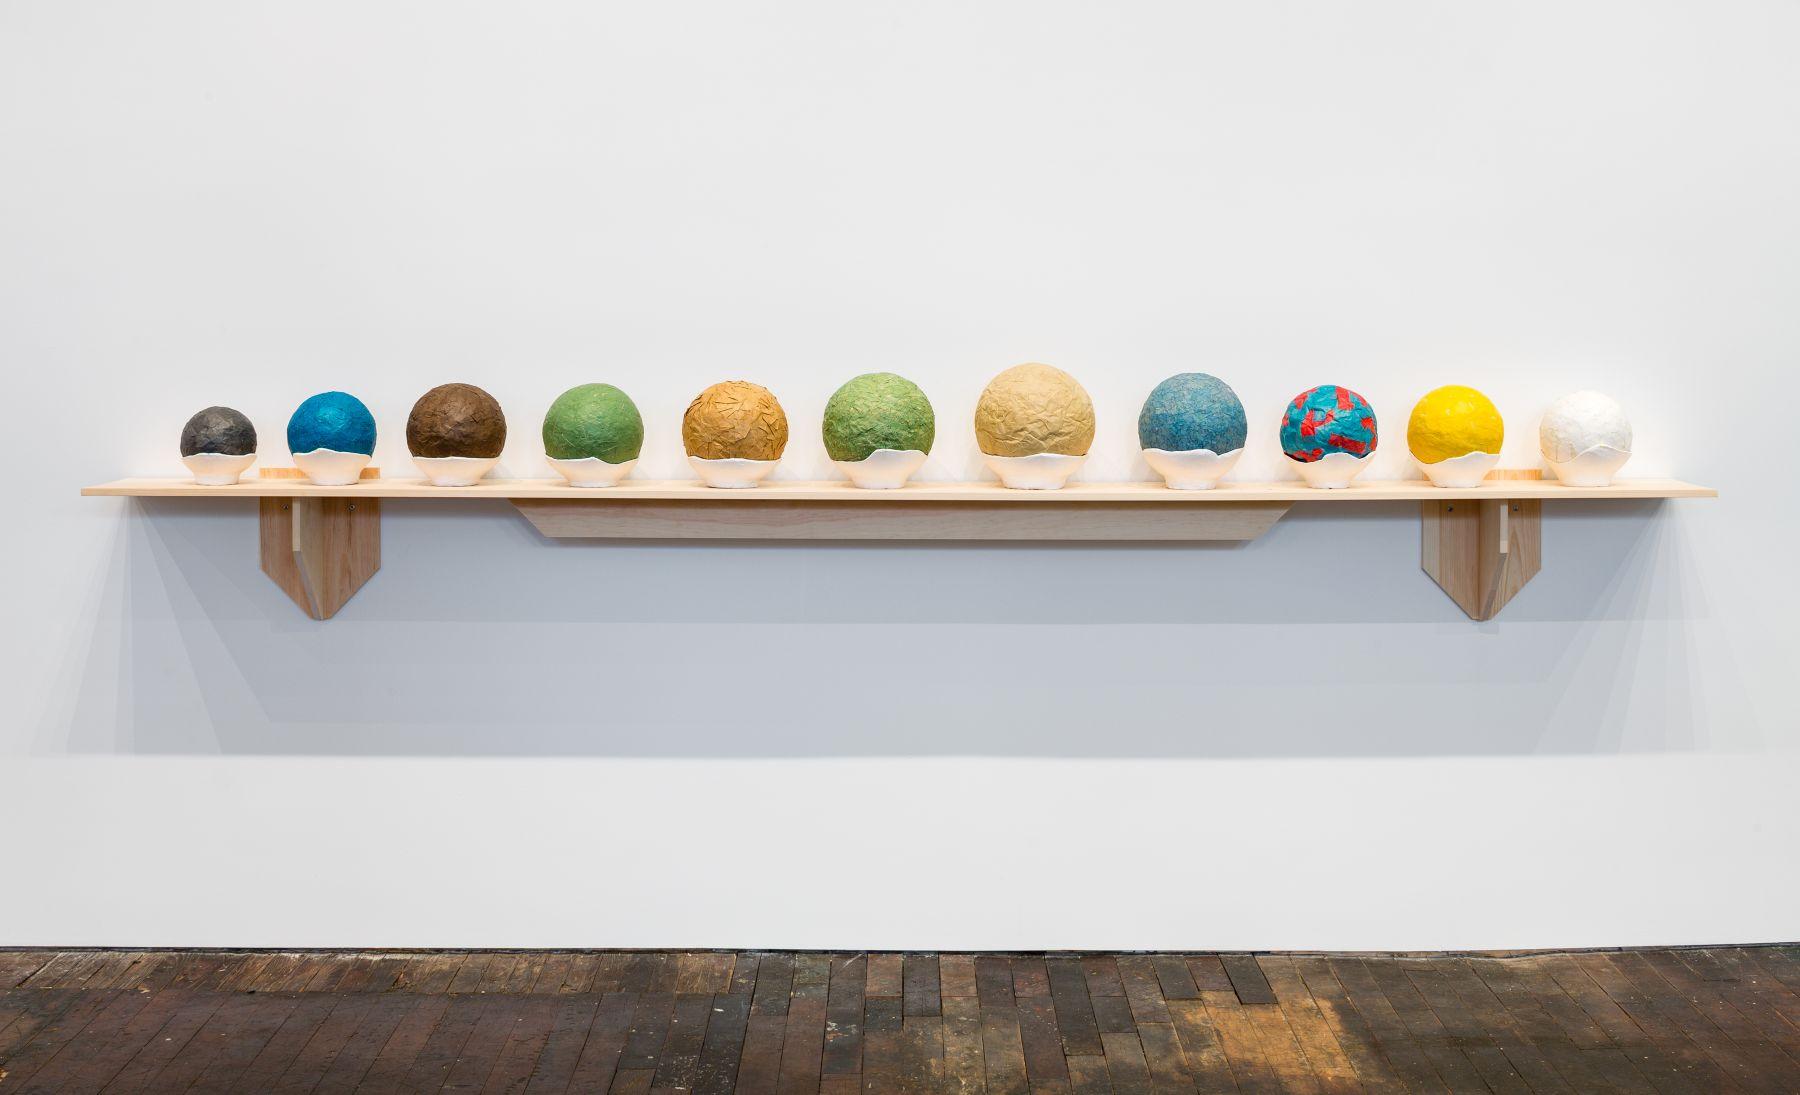 Circumstantial Balls, 2003-2015